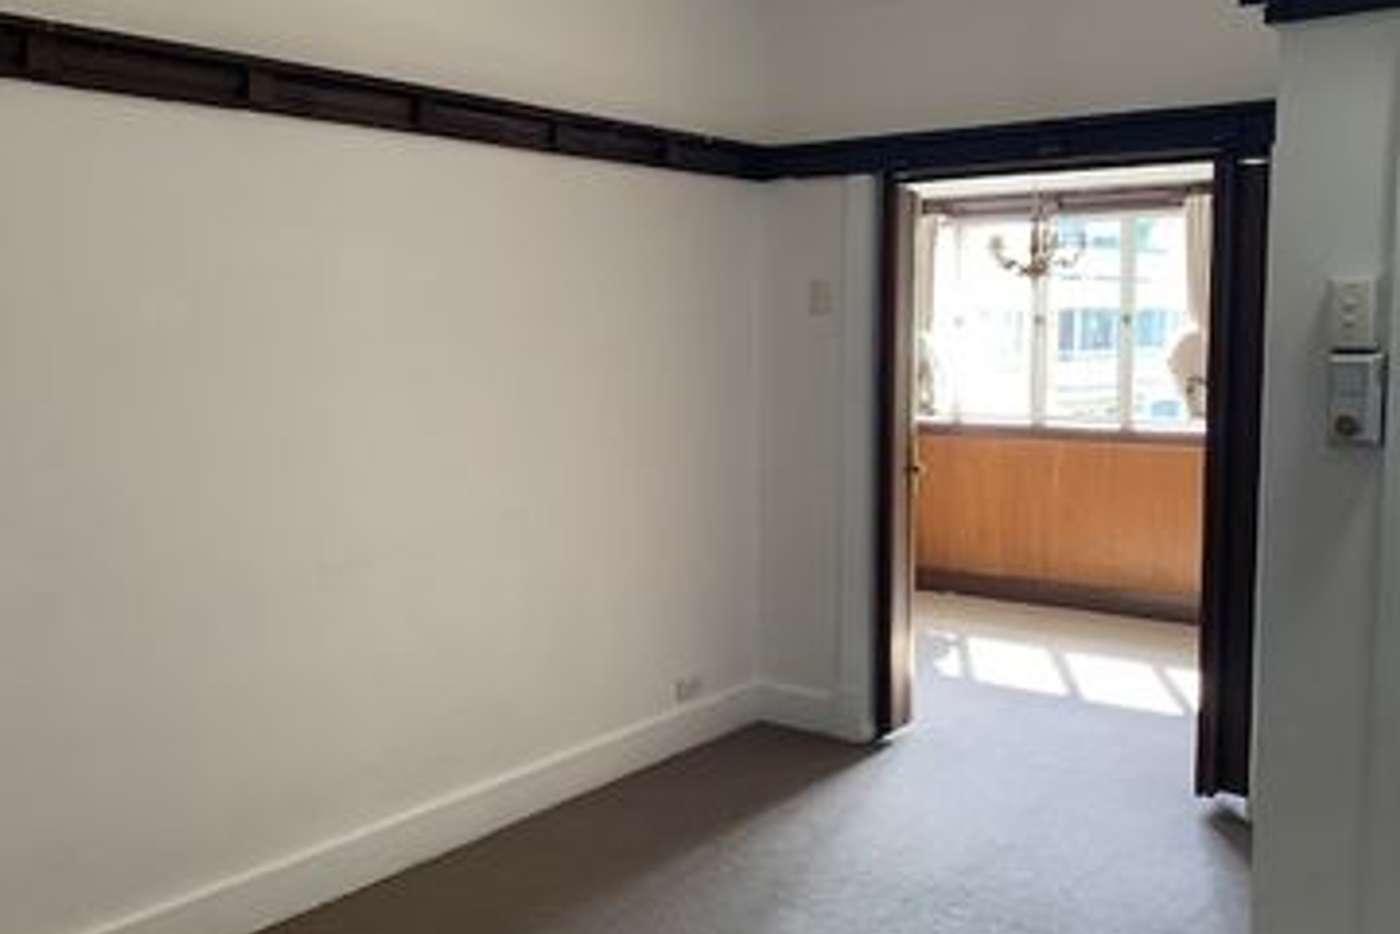 Seventh view of Homely unit listing, 2/1 Hazel Street, New Farm QLD 4005